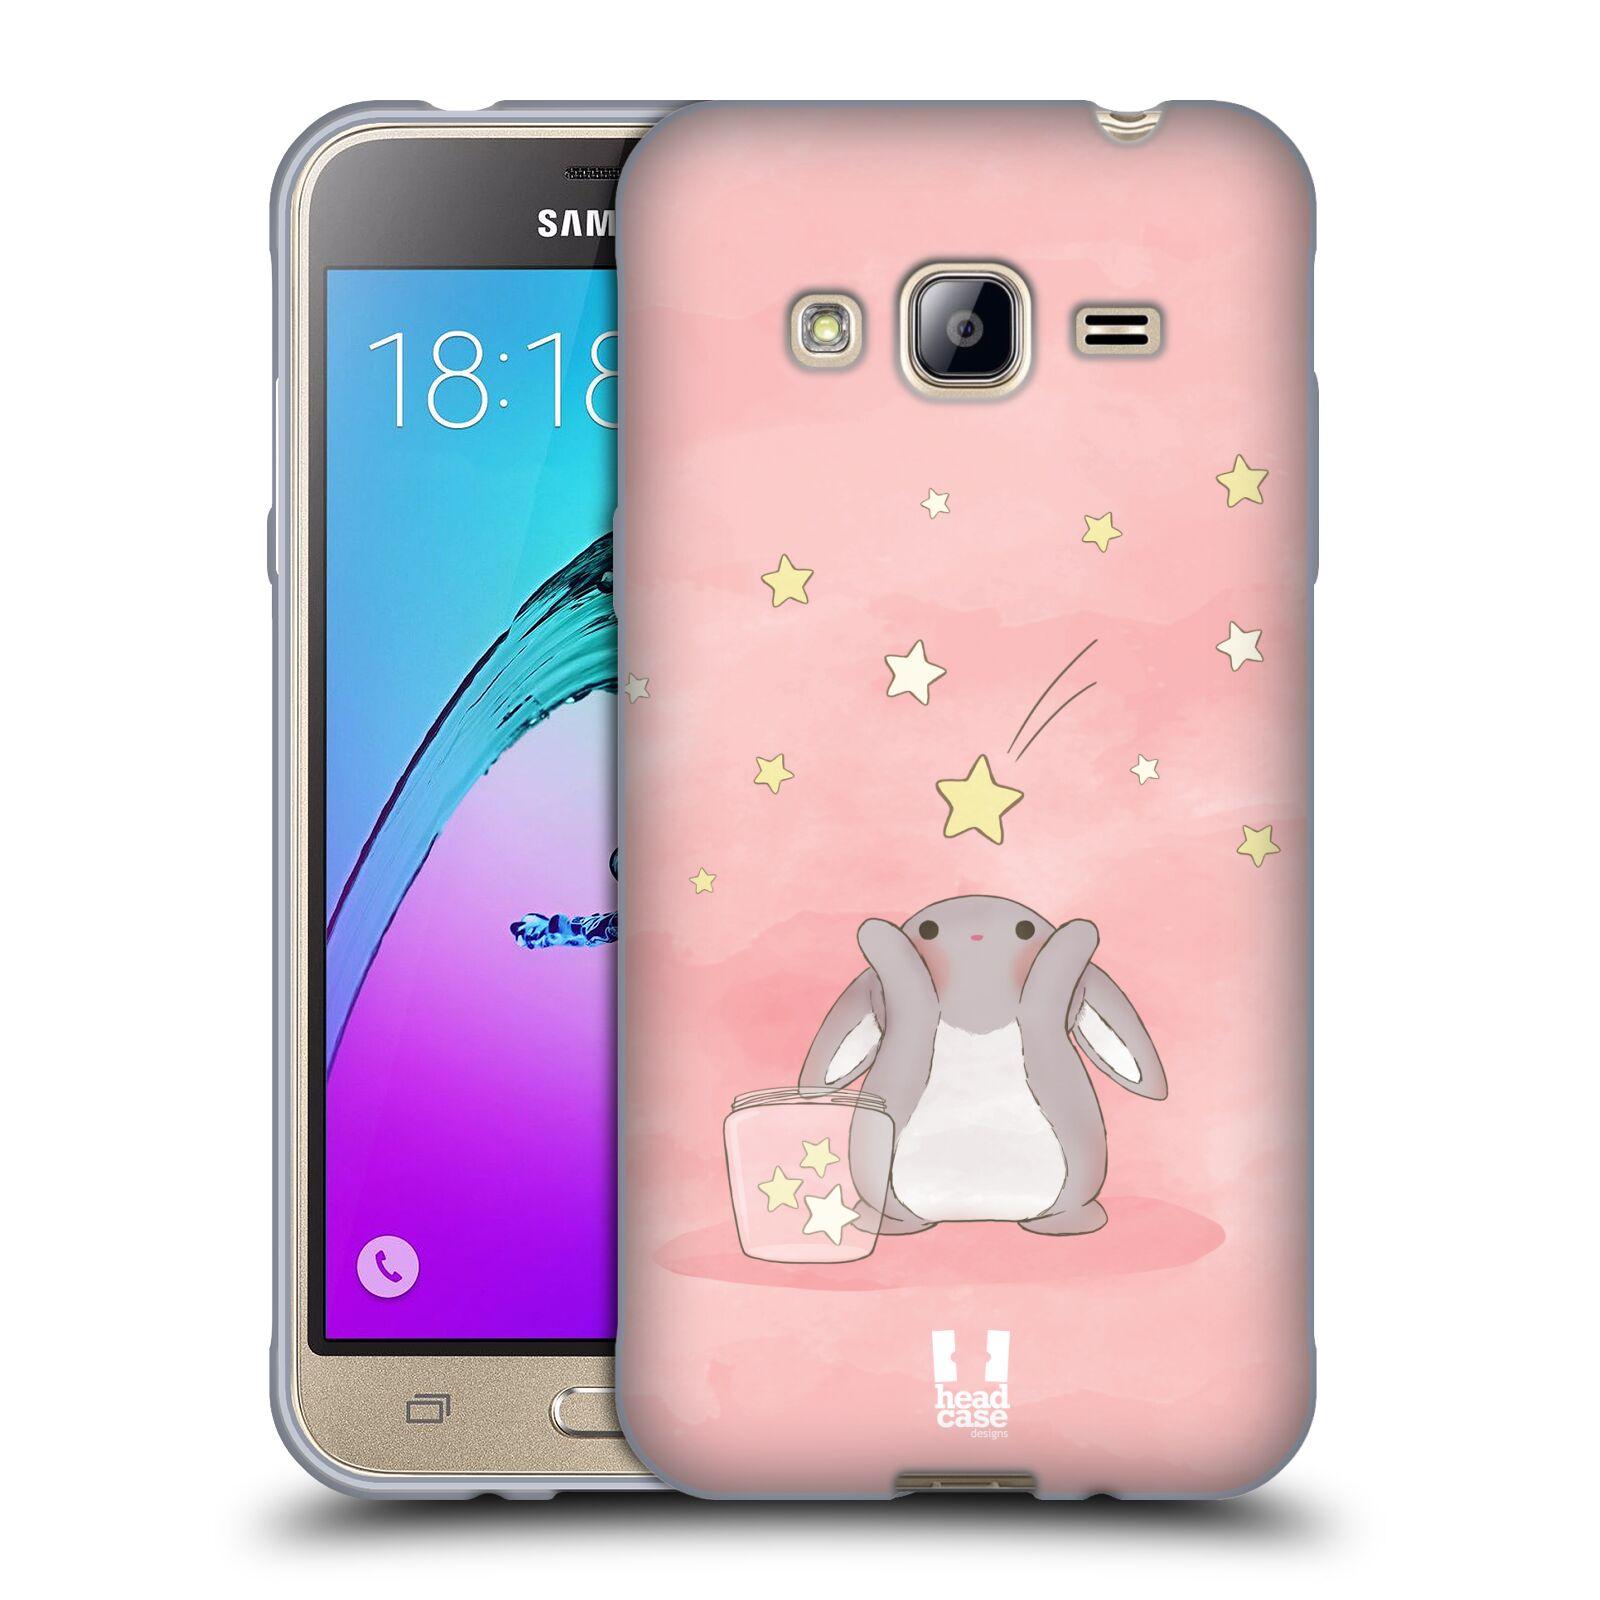 HEAD CASE silikonový obal na mobil Samsung Galaxy J3, J3 2016 vzor králíček a hvězdy růžová